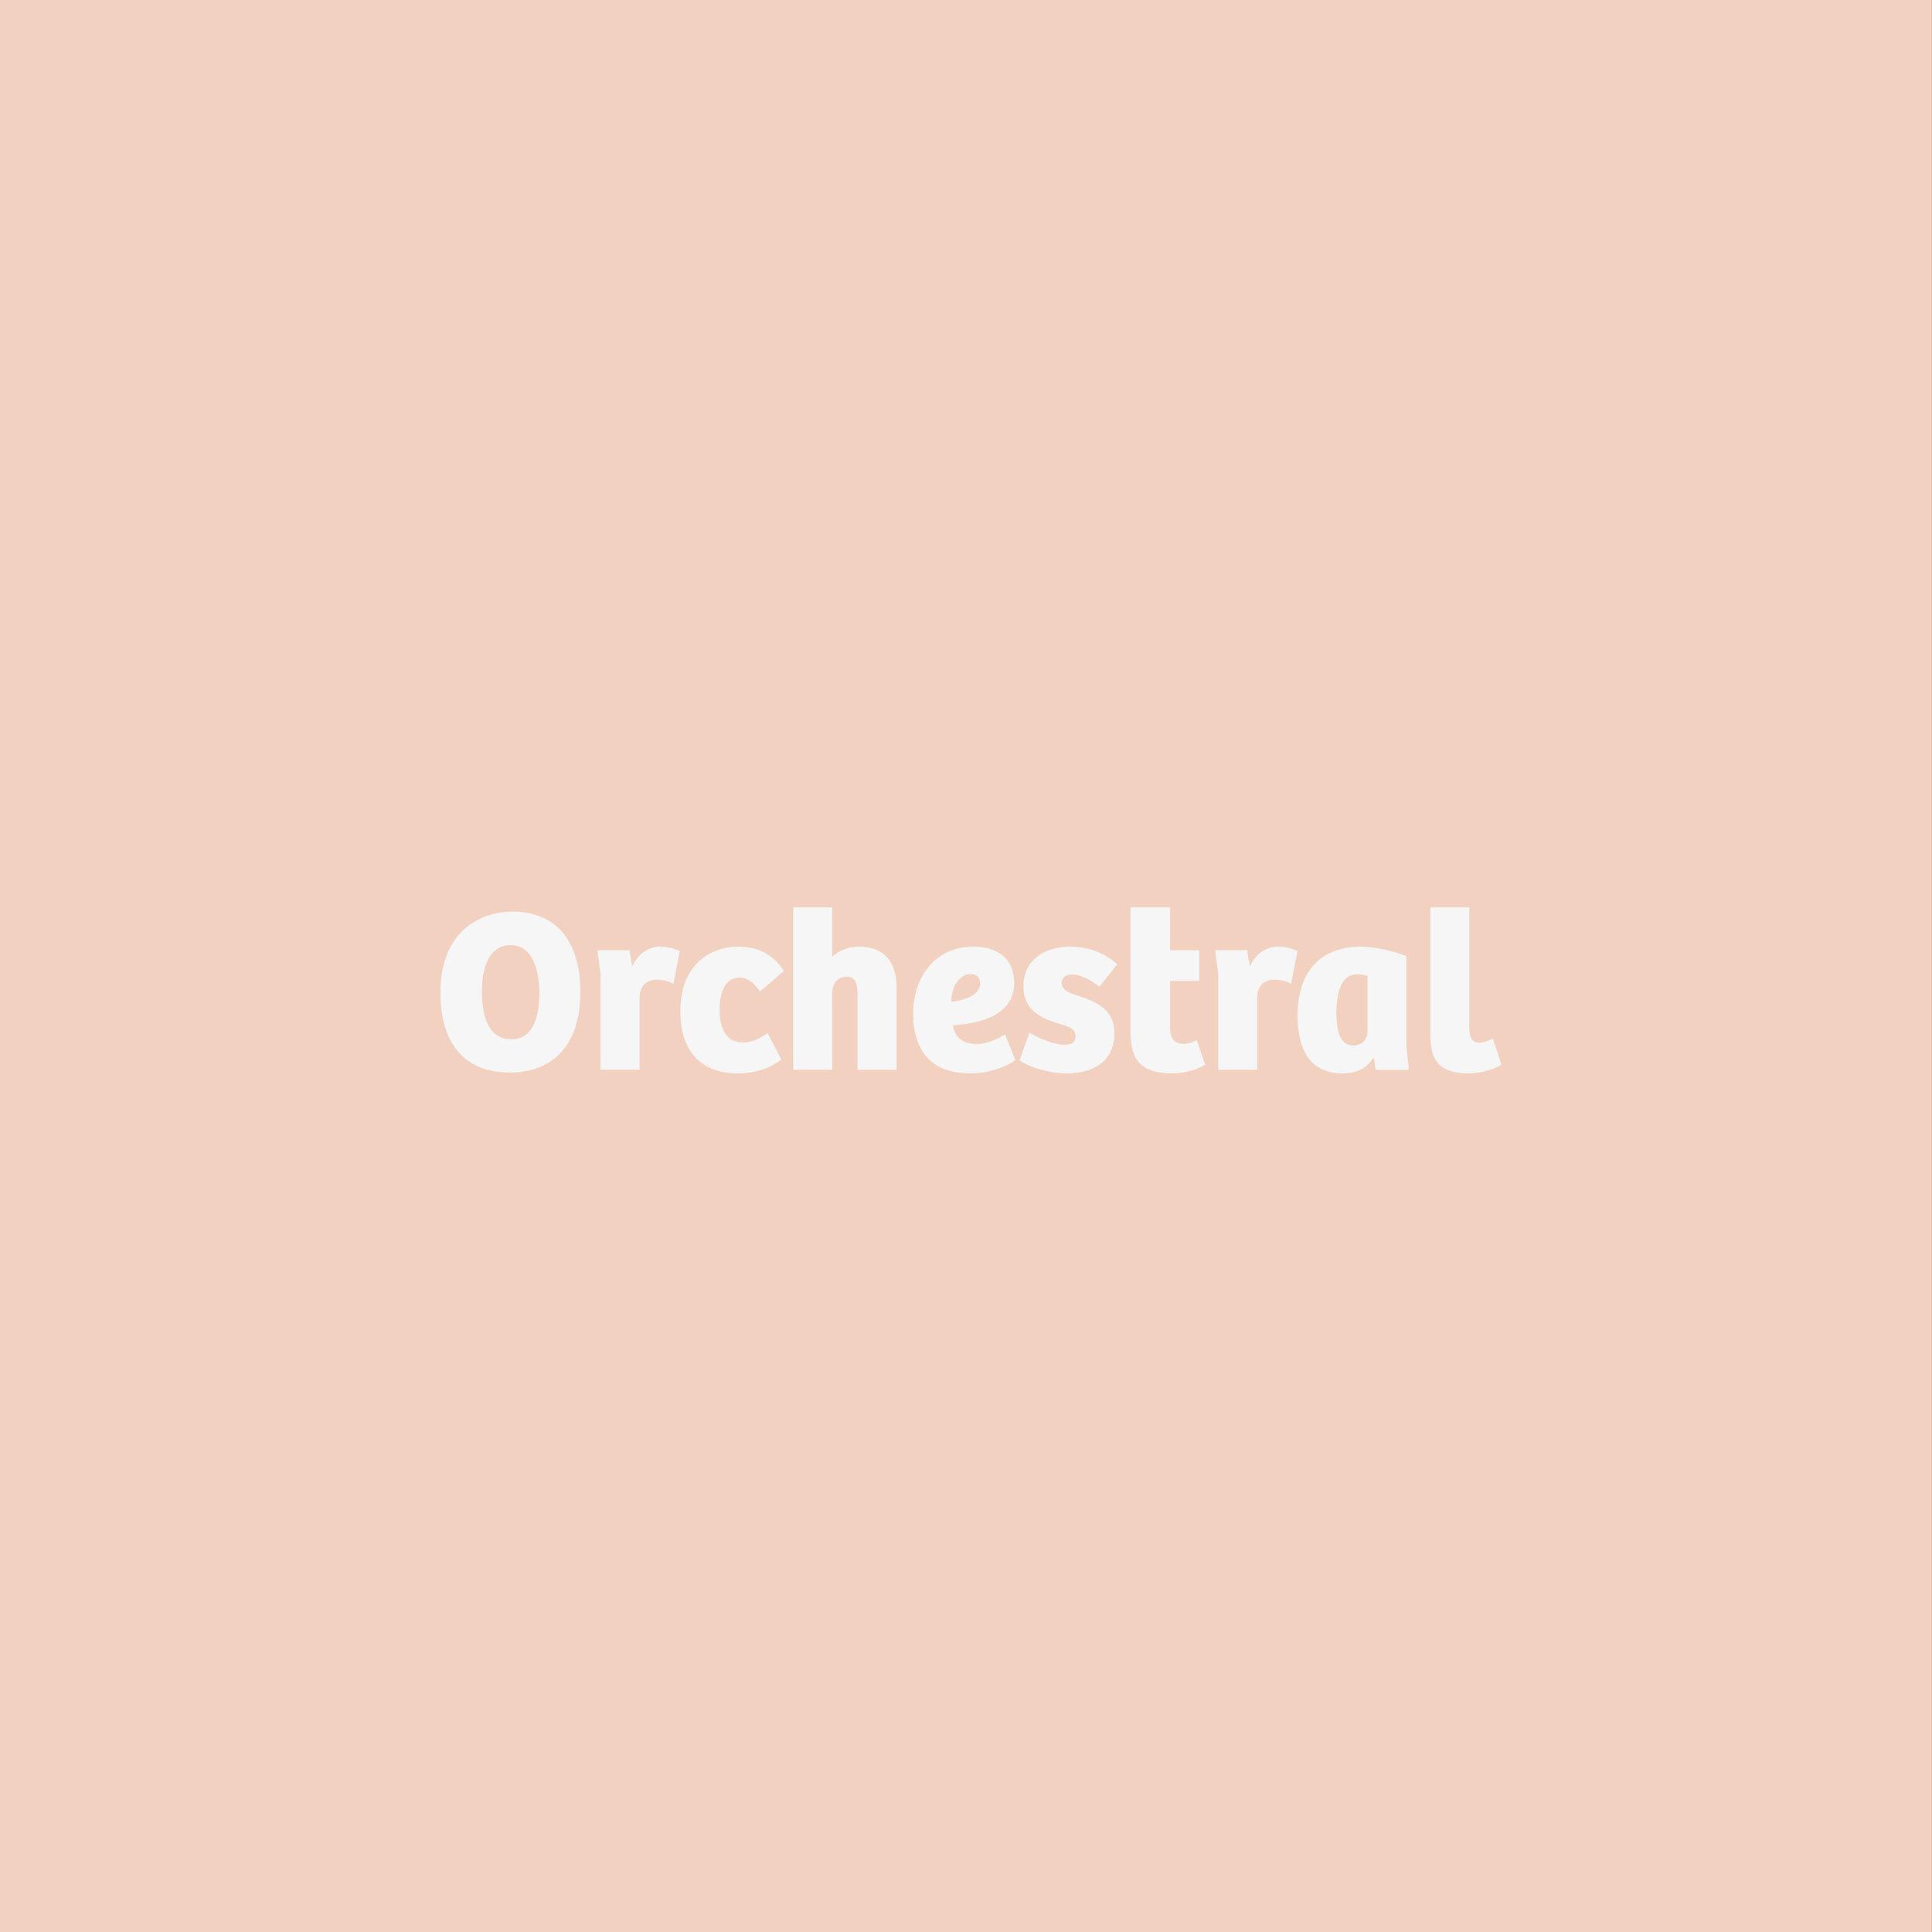 Orchestral button